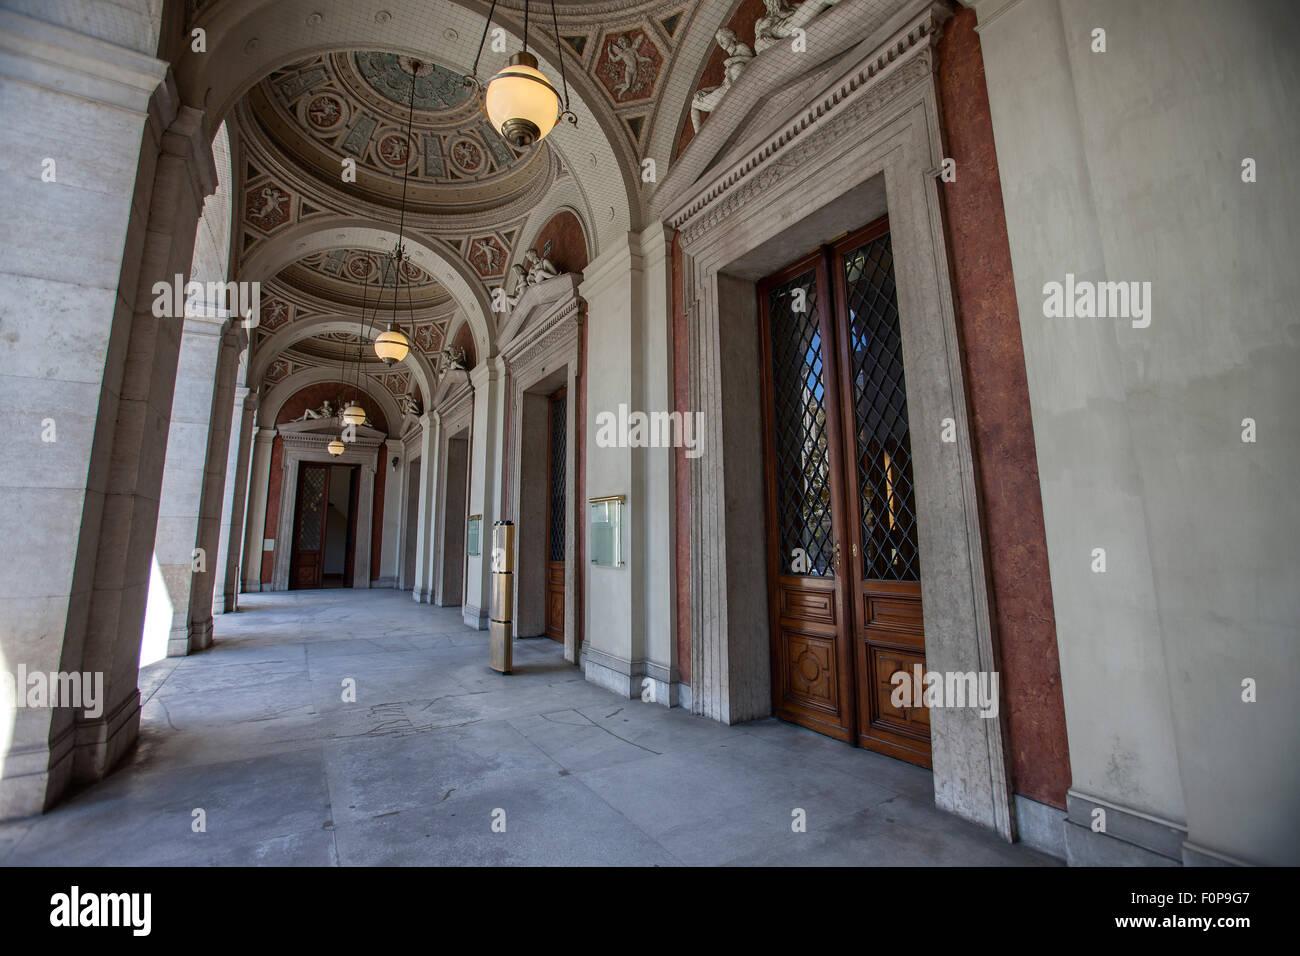 Stock Exchange in Vienna, Austria, Europe Stock Photo